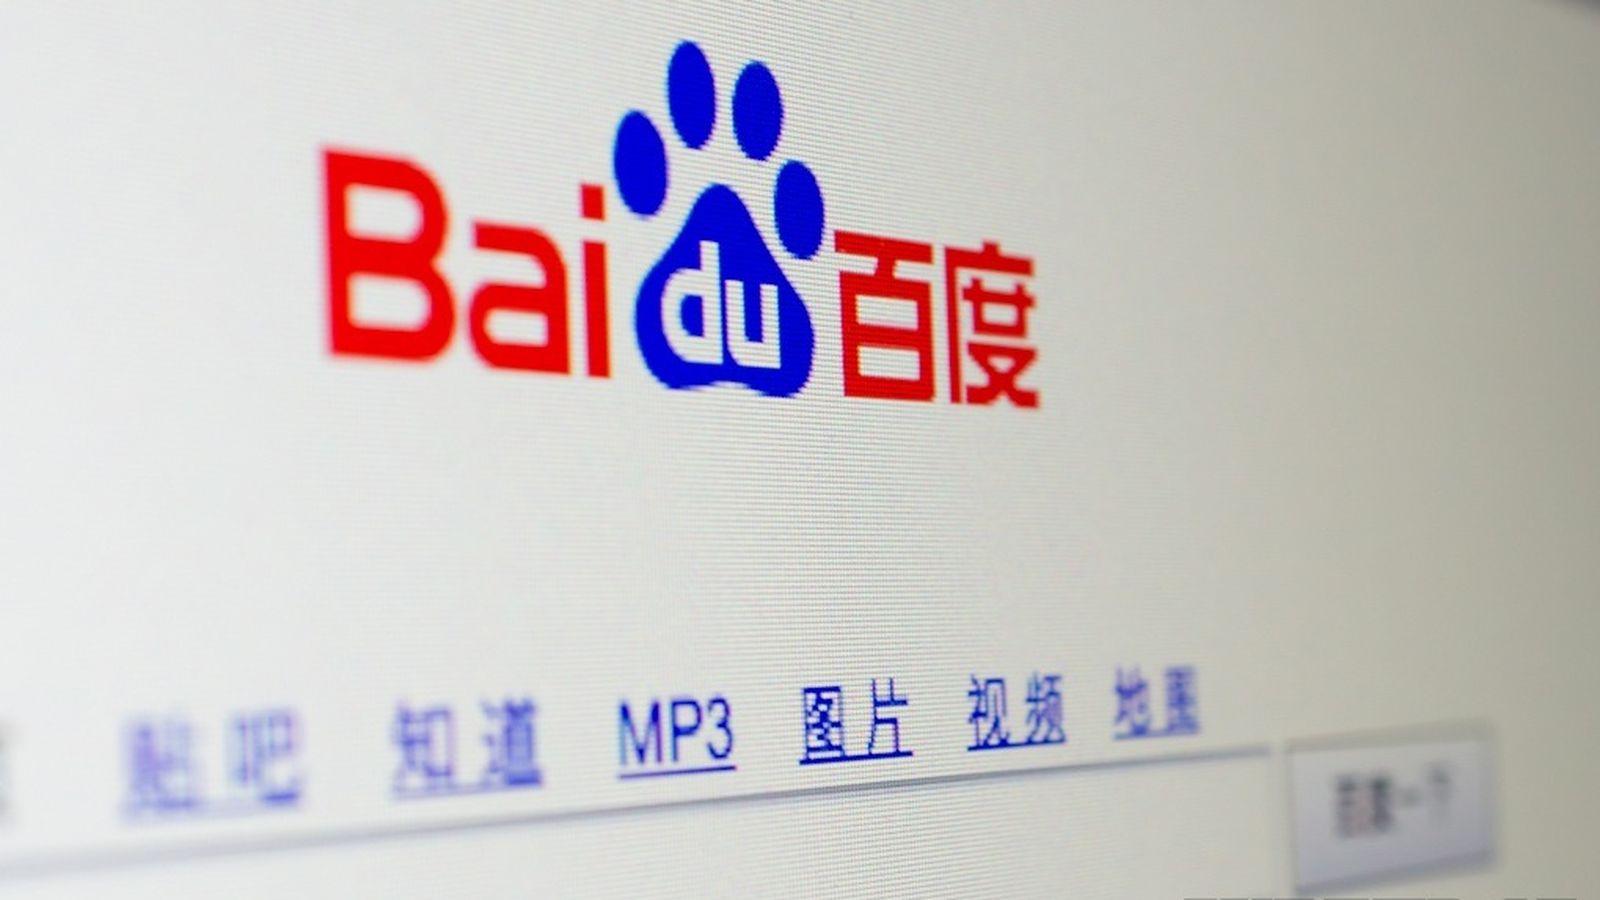 1600x900 > Baidu Wallpapers